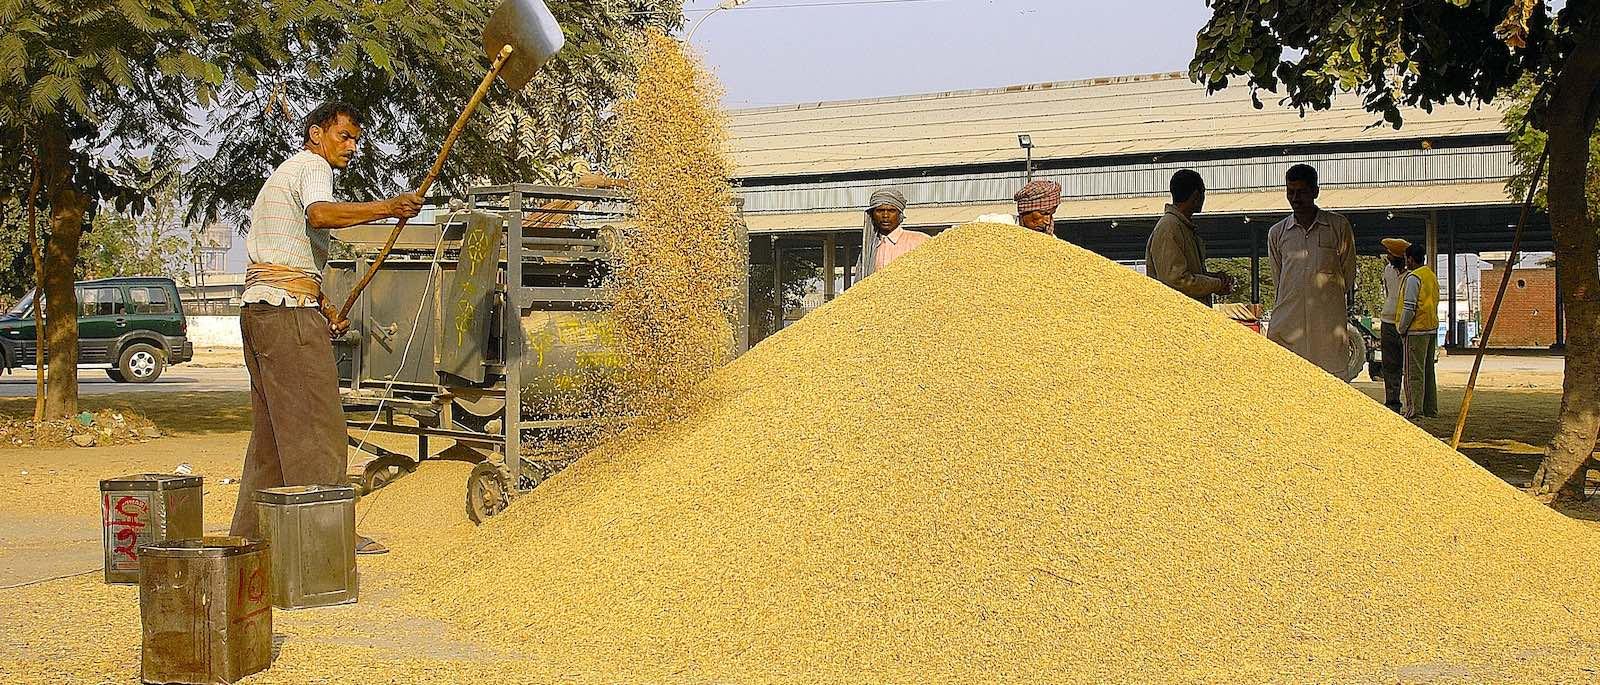 Khanna grain market, India (Photo: Giridhar Appaji Nag Y/Flickr)